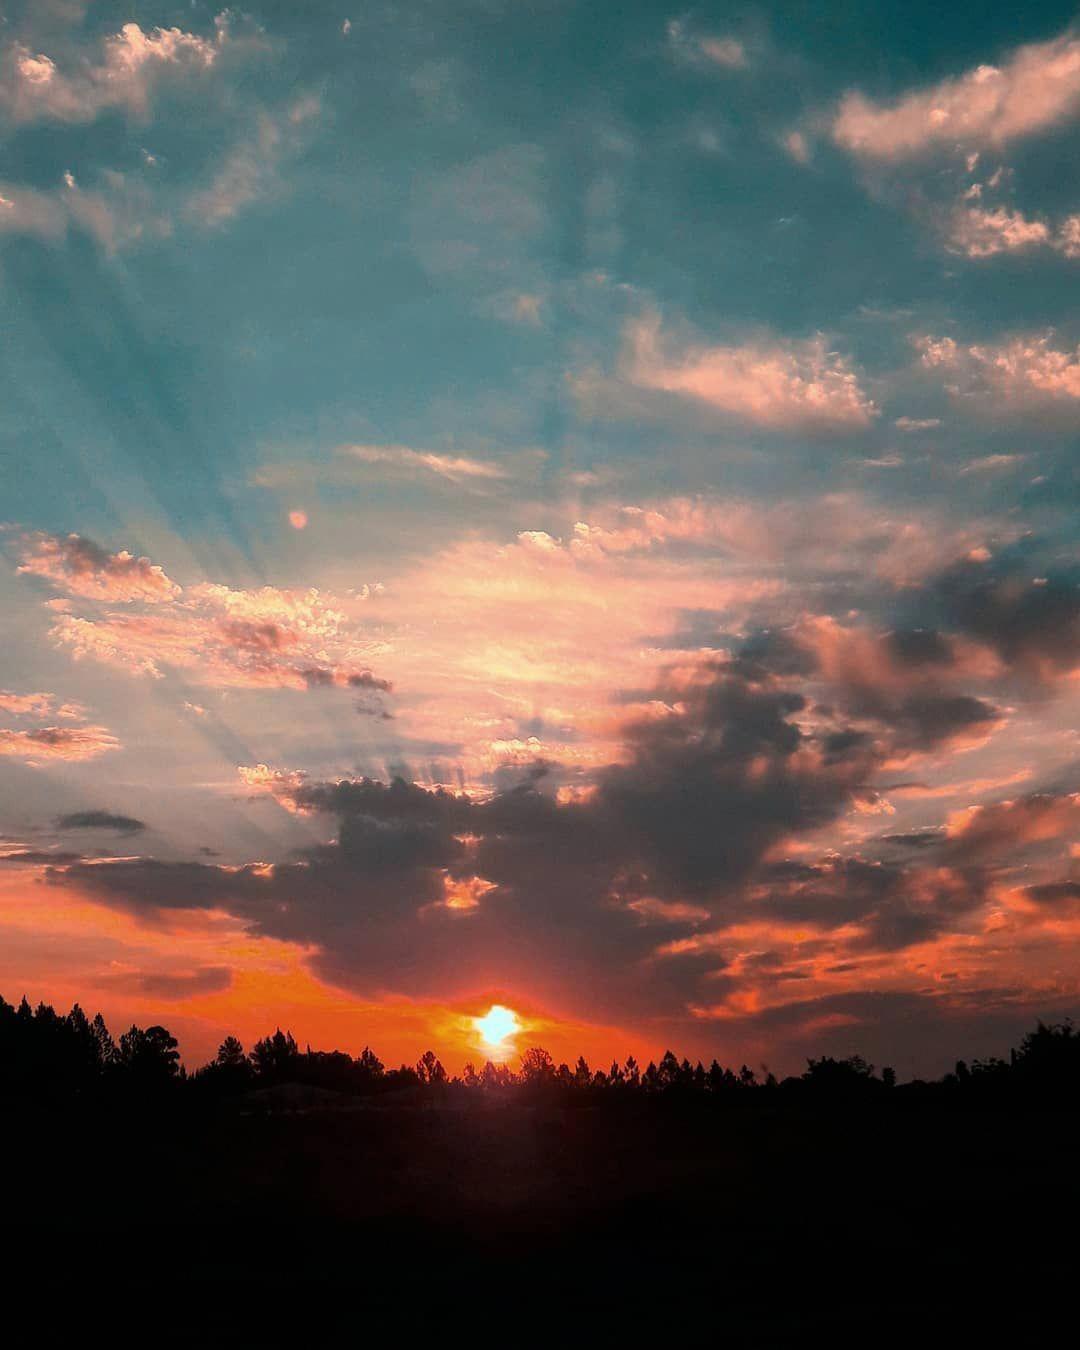 Amazing Sky Landscape Photography Skylandscapephotography Sky Aesthetic Sky Photography Sunset Pictures